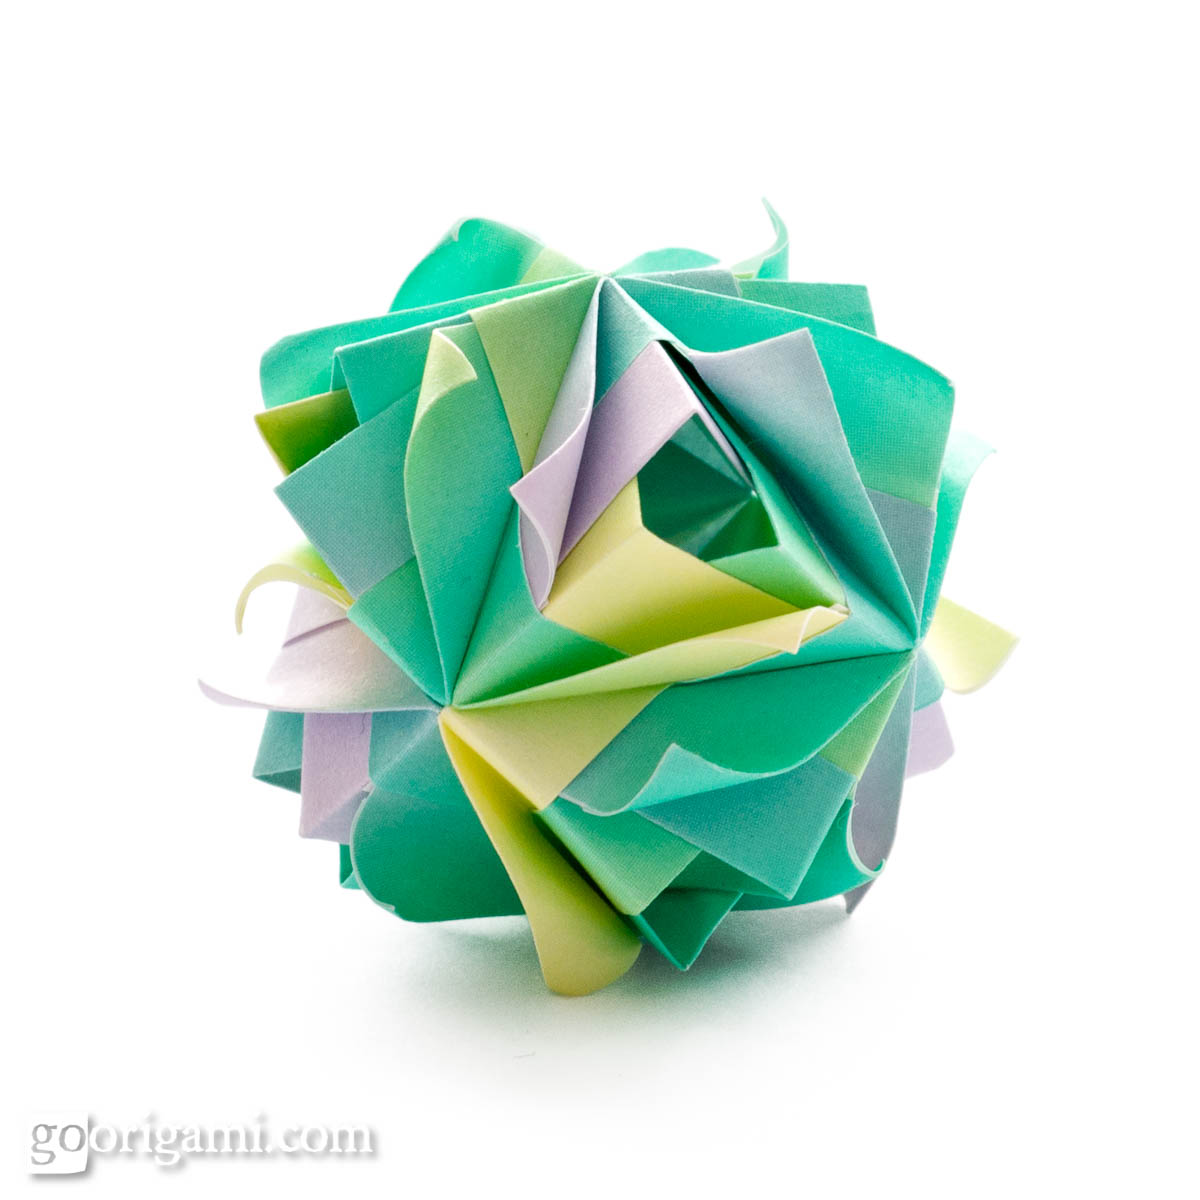 kusudama ball diagram 2003 jetta 1 8t wiring etna by maria sinayskaya  go origami